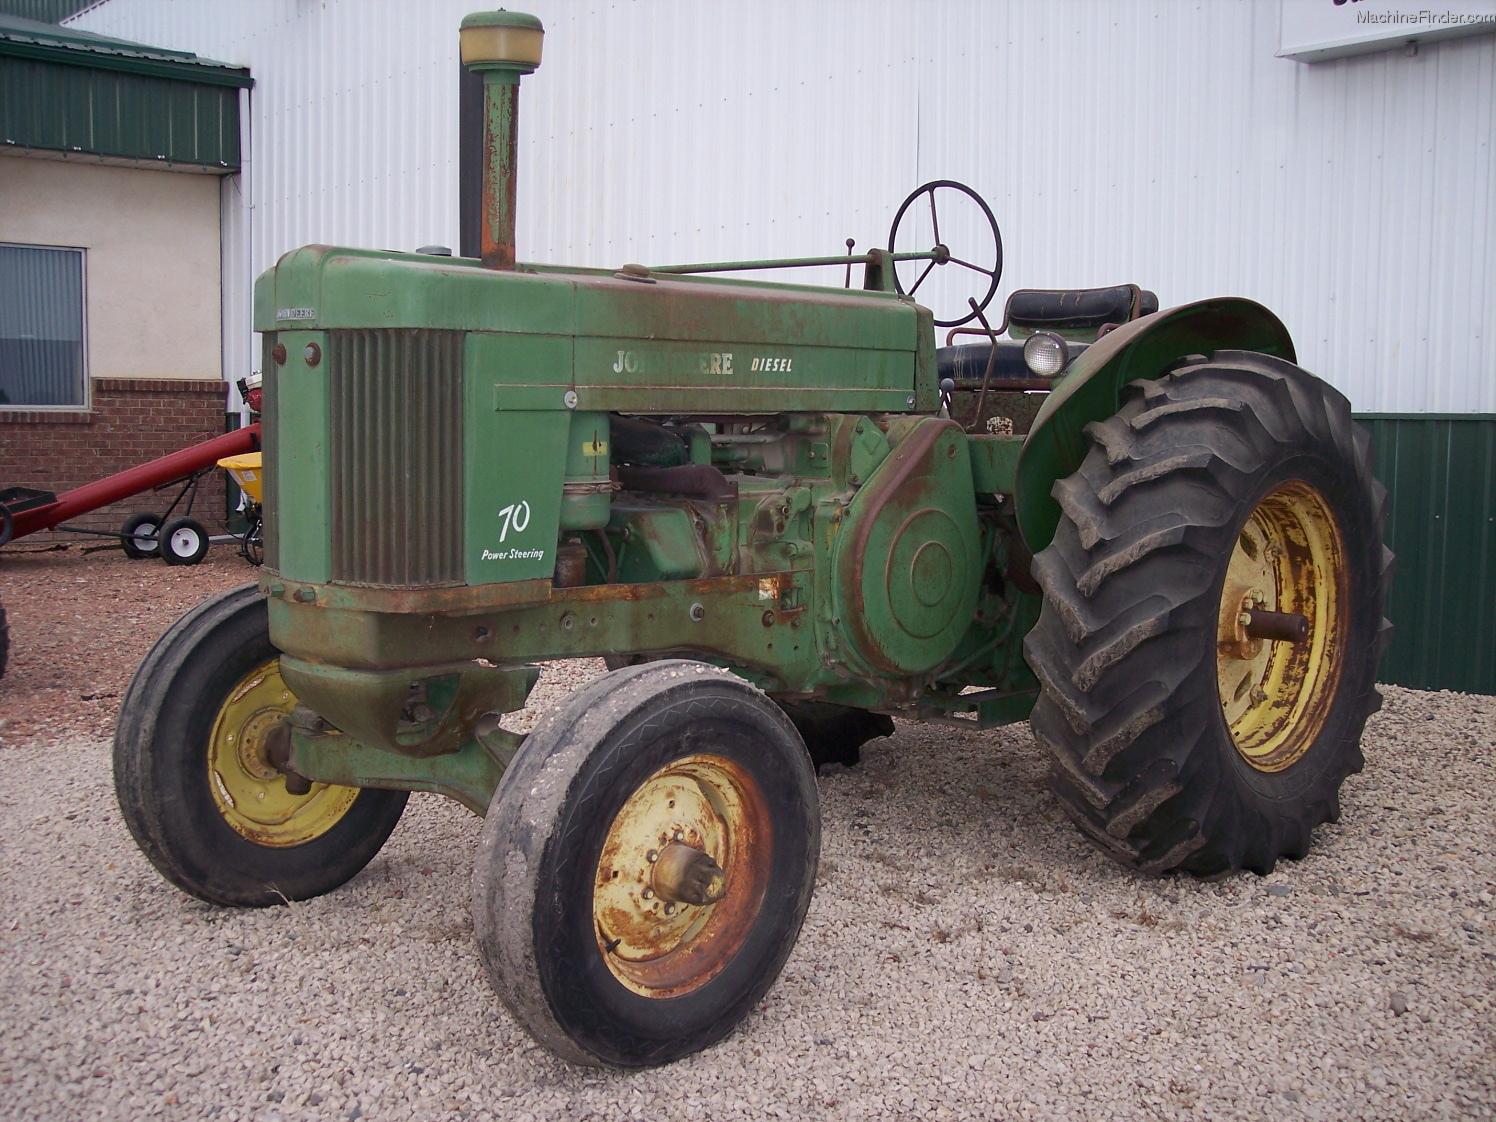 1955 John Deere 70 Tractors - Compact (1-40hp.) - John ...